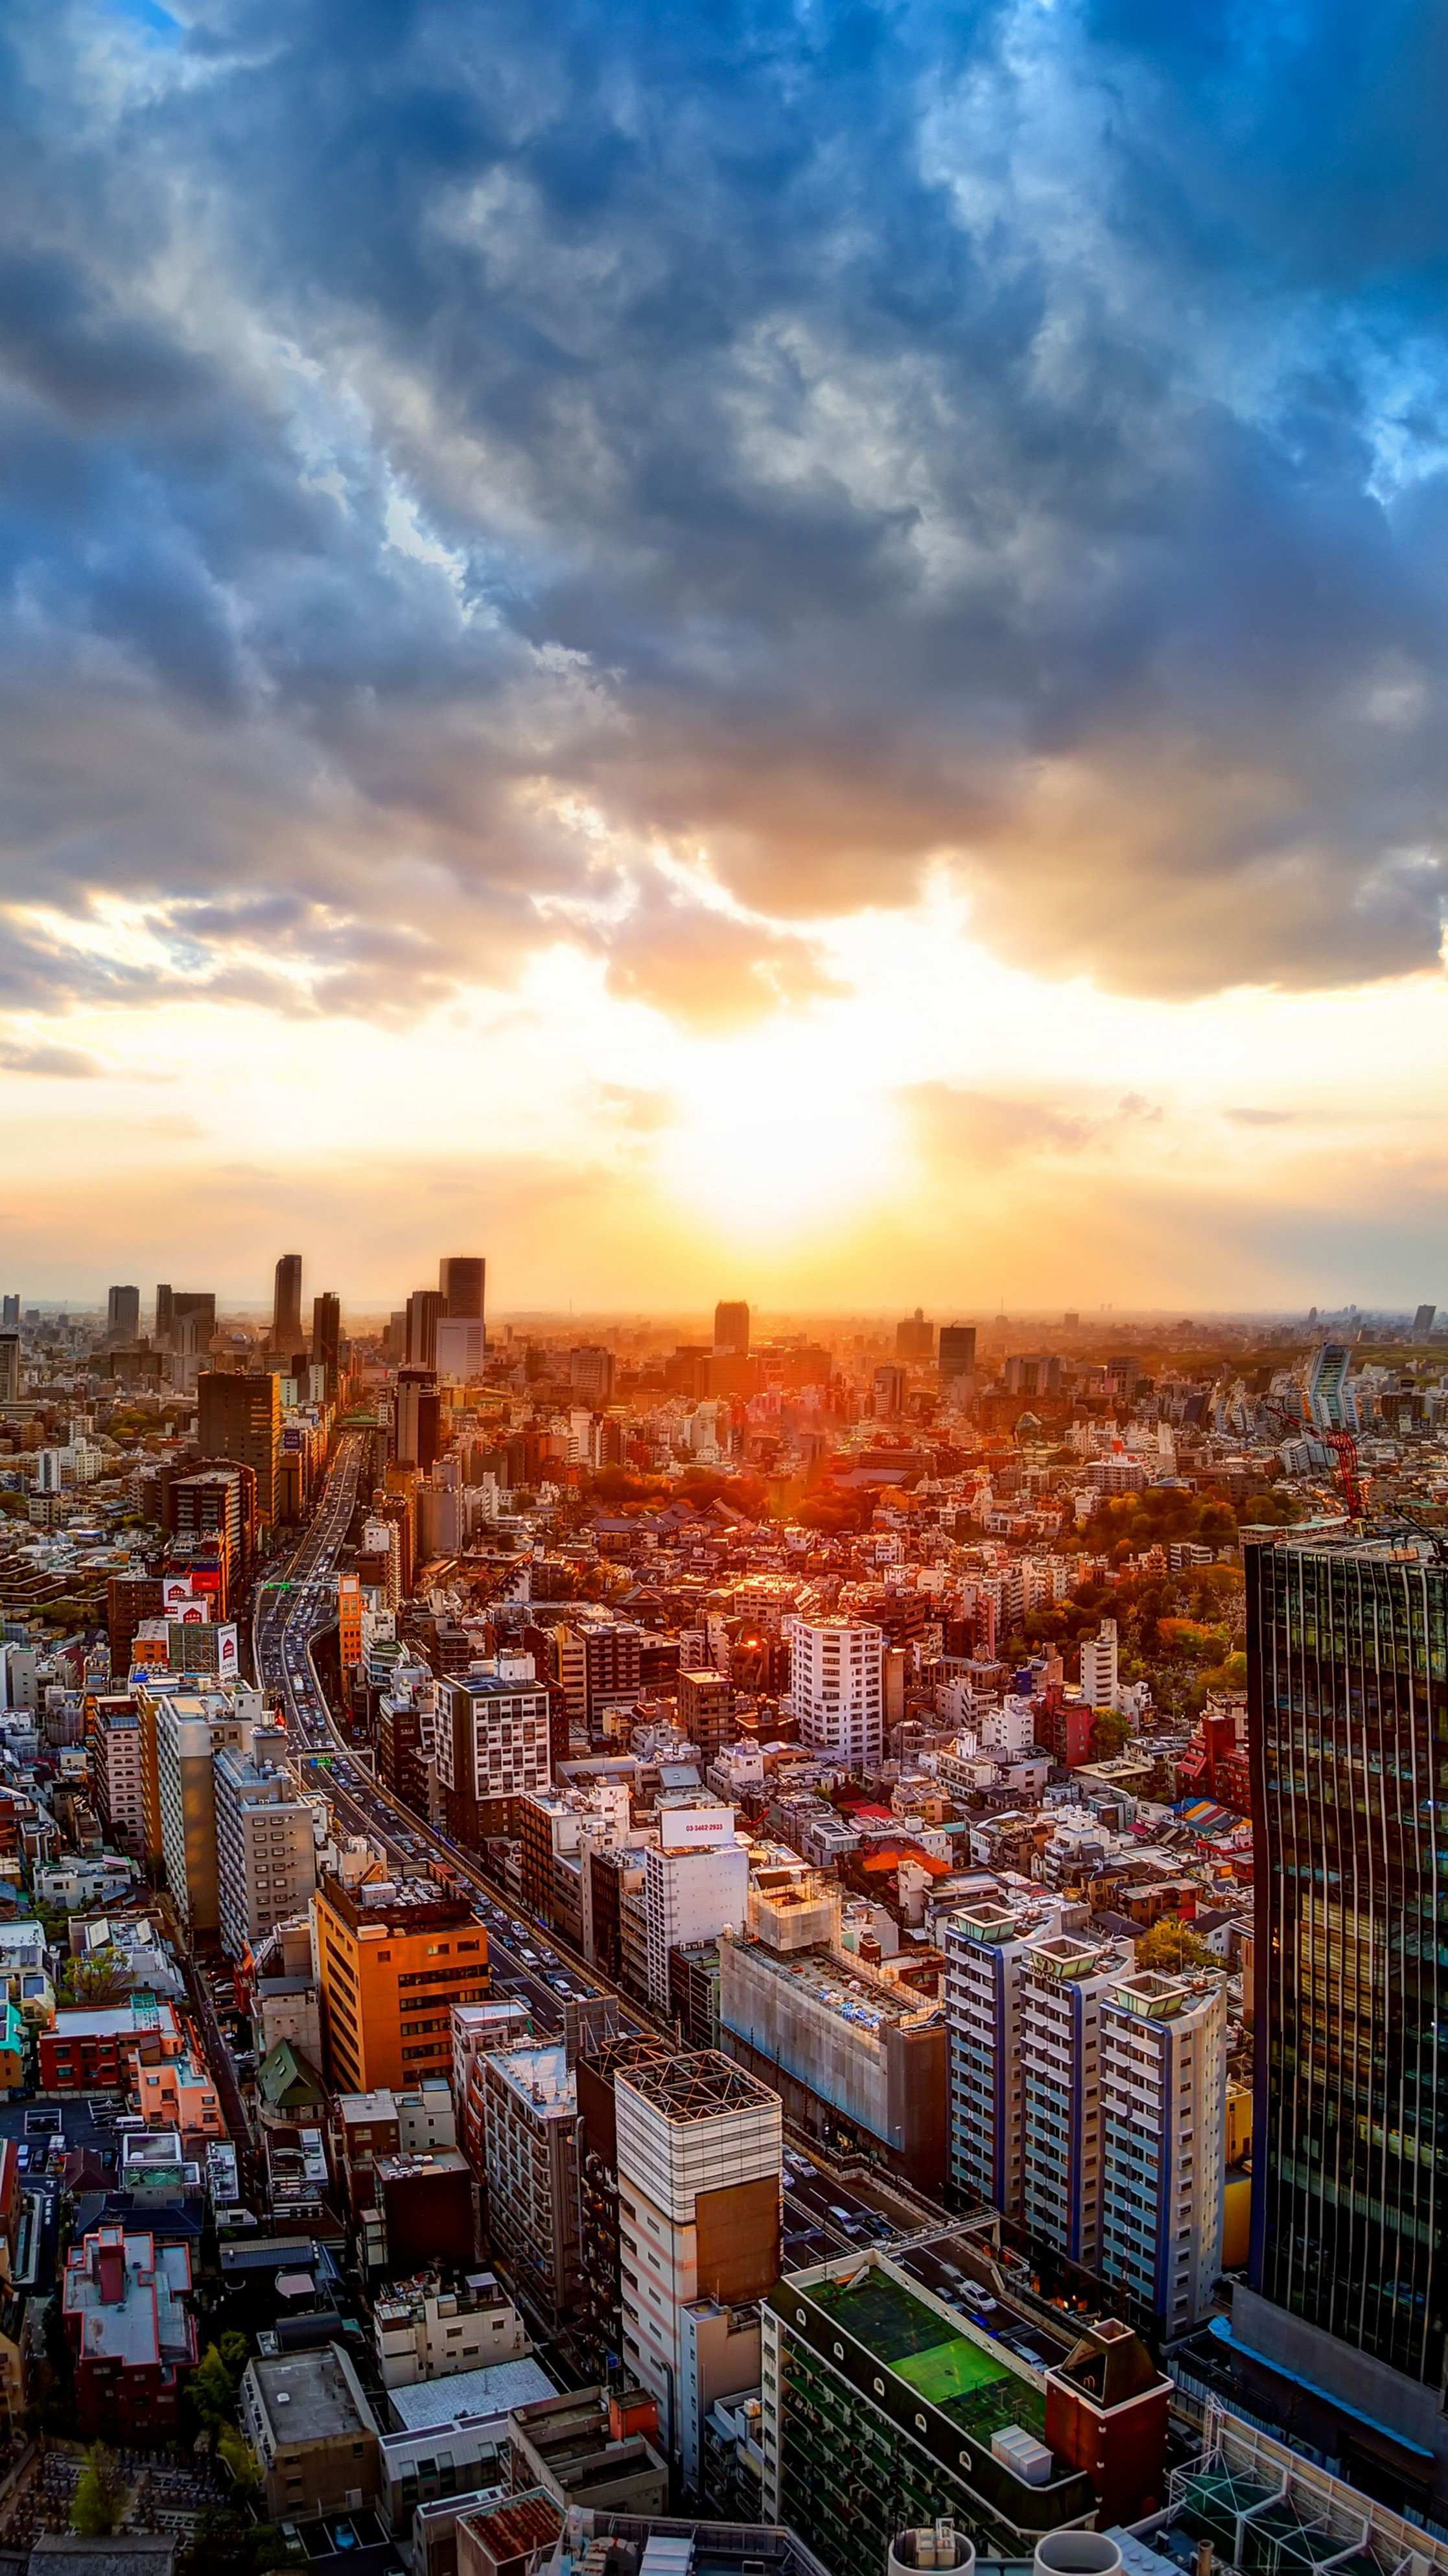 Sunrise In Tokyo Wallpaper Iphone Wallpaper Tokyo Tokyo City Sunrise Wallpaper